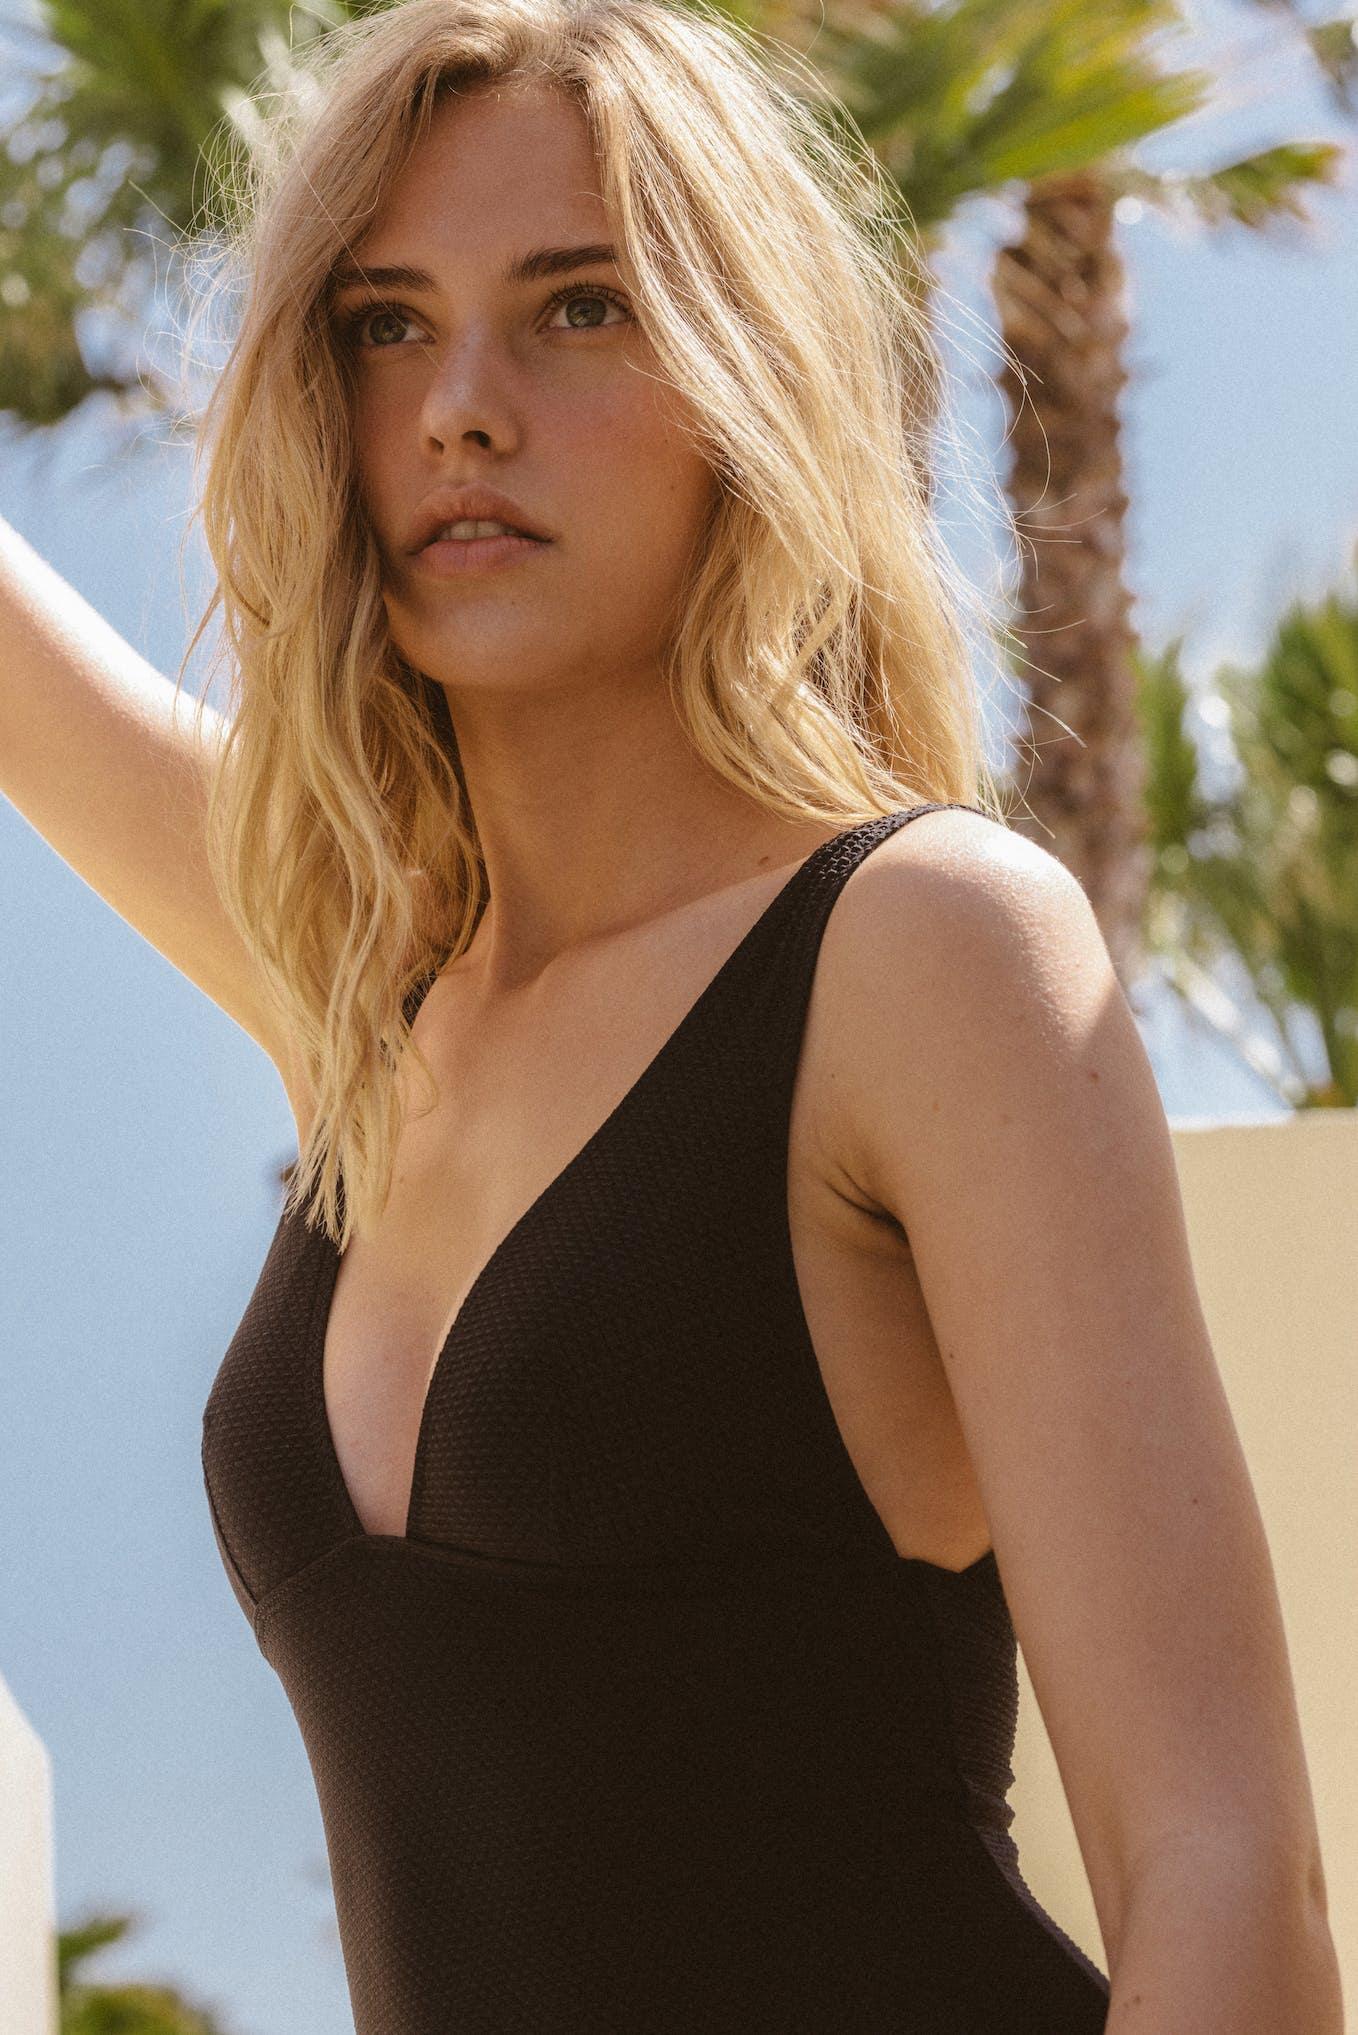 Swimsuit Rêve d'horizon in black